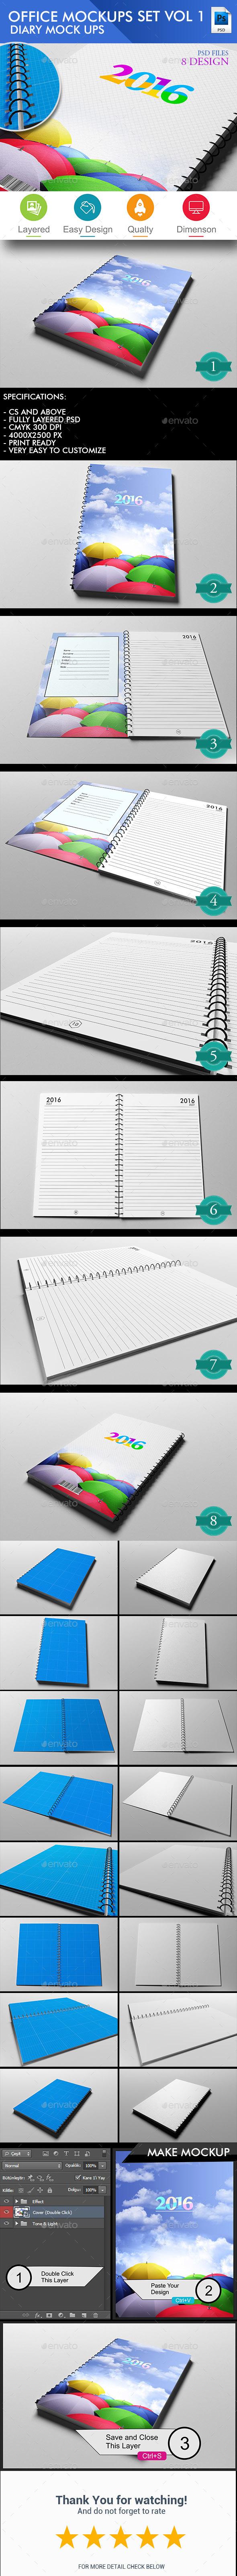 Diary Cover Mockup - Volume 1 - Books Print